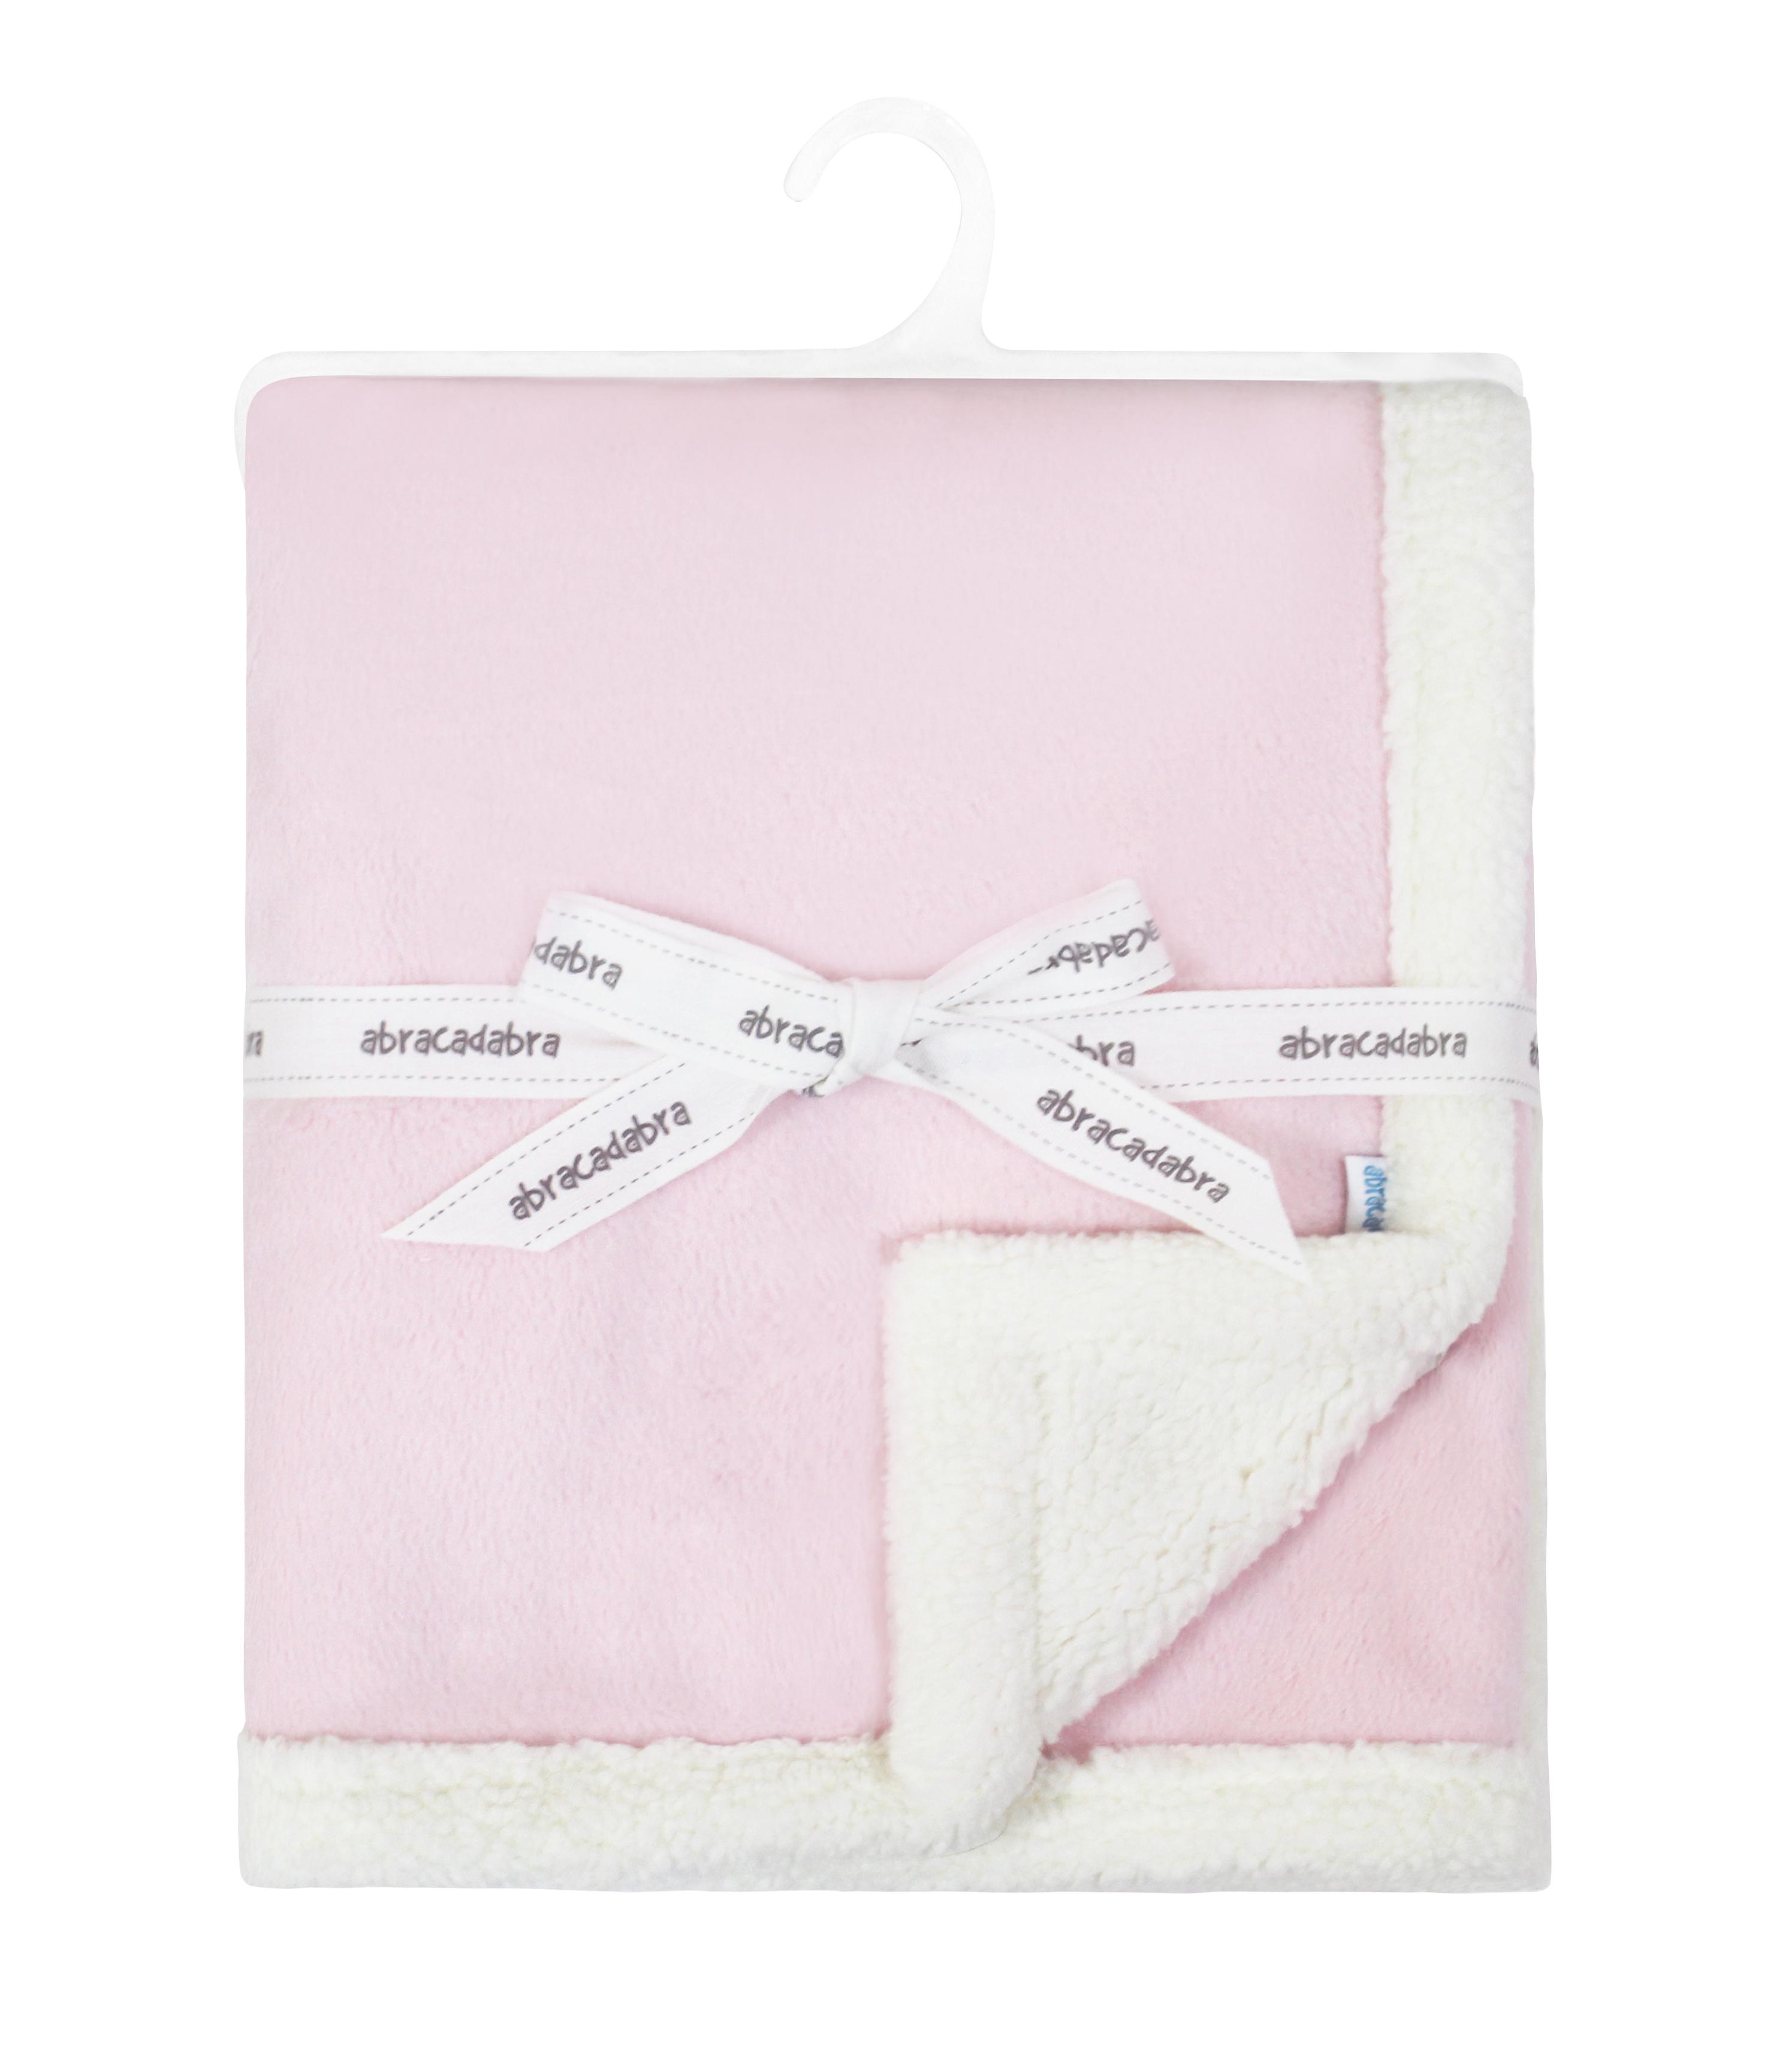 Mothercare | Abracadabra Chamois Blanket - Pink